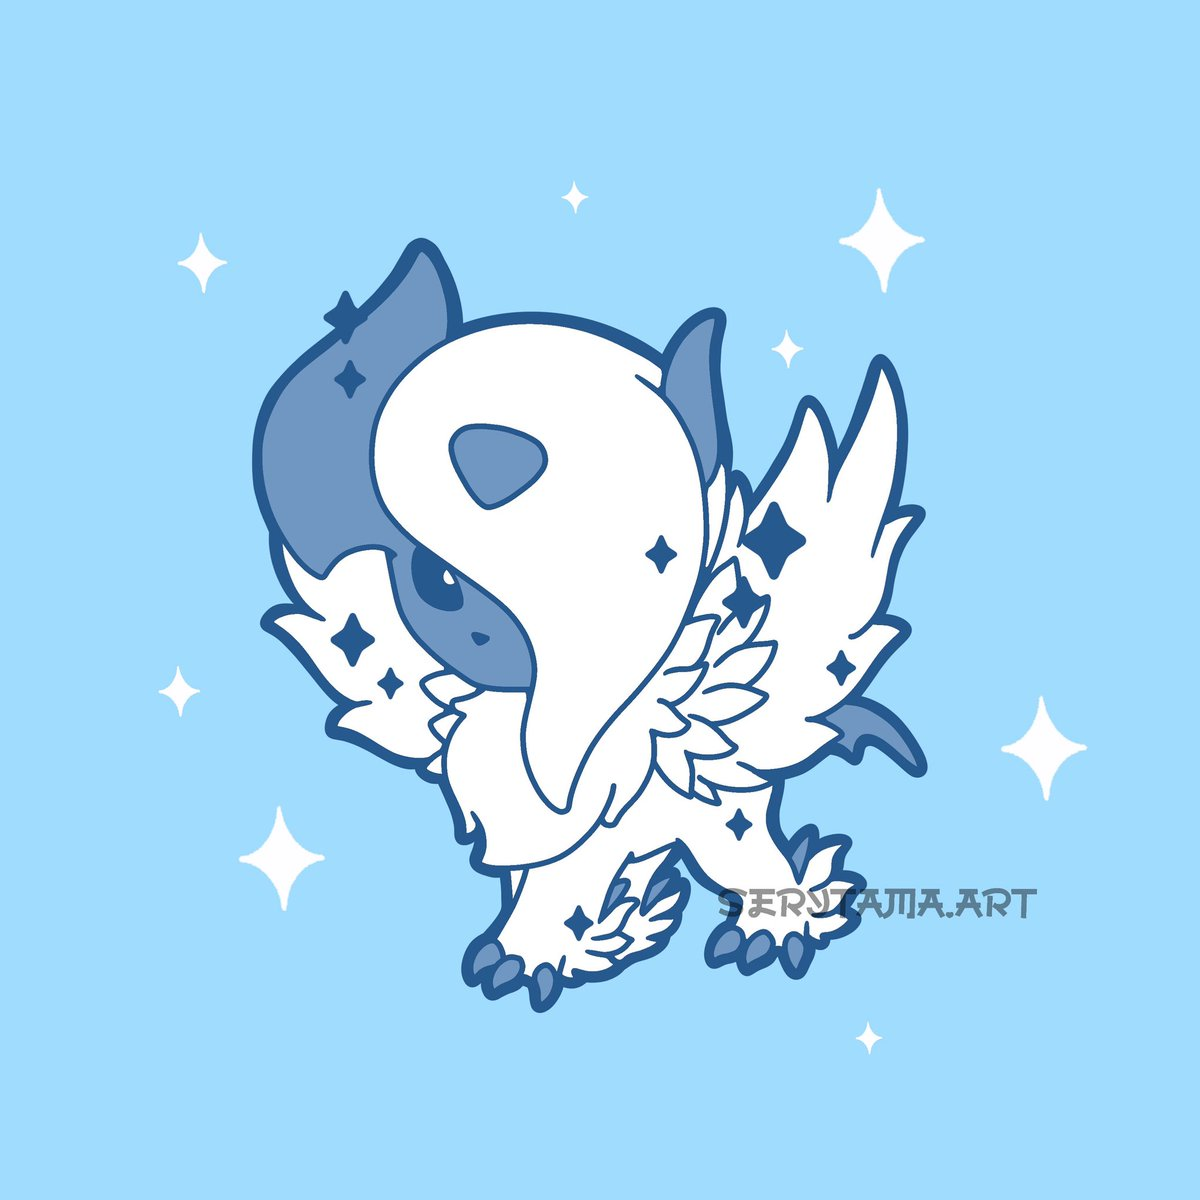 Mega absol 💙 actually one of my favorite Pokémon ever as well 😭 I always felt bad for the way it was misunderstood by people  . . . . . . #kawaii #cute #absol #pokemon #pokémon #pokemonart #pokemonartwork #fanart #animefanart #chibi #anime #manga #digital #digitalart